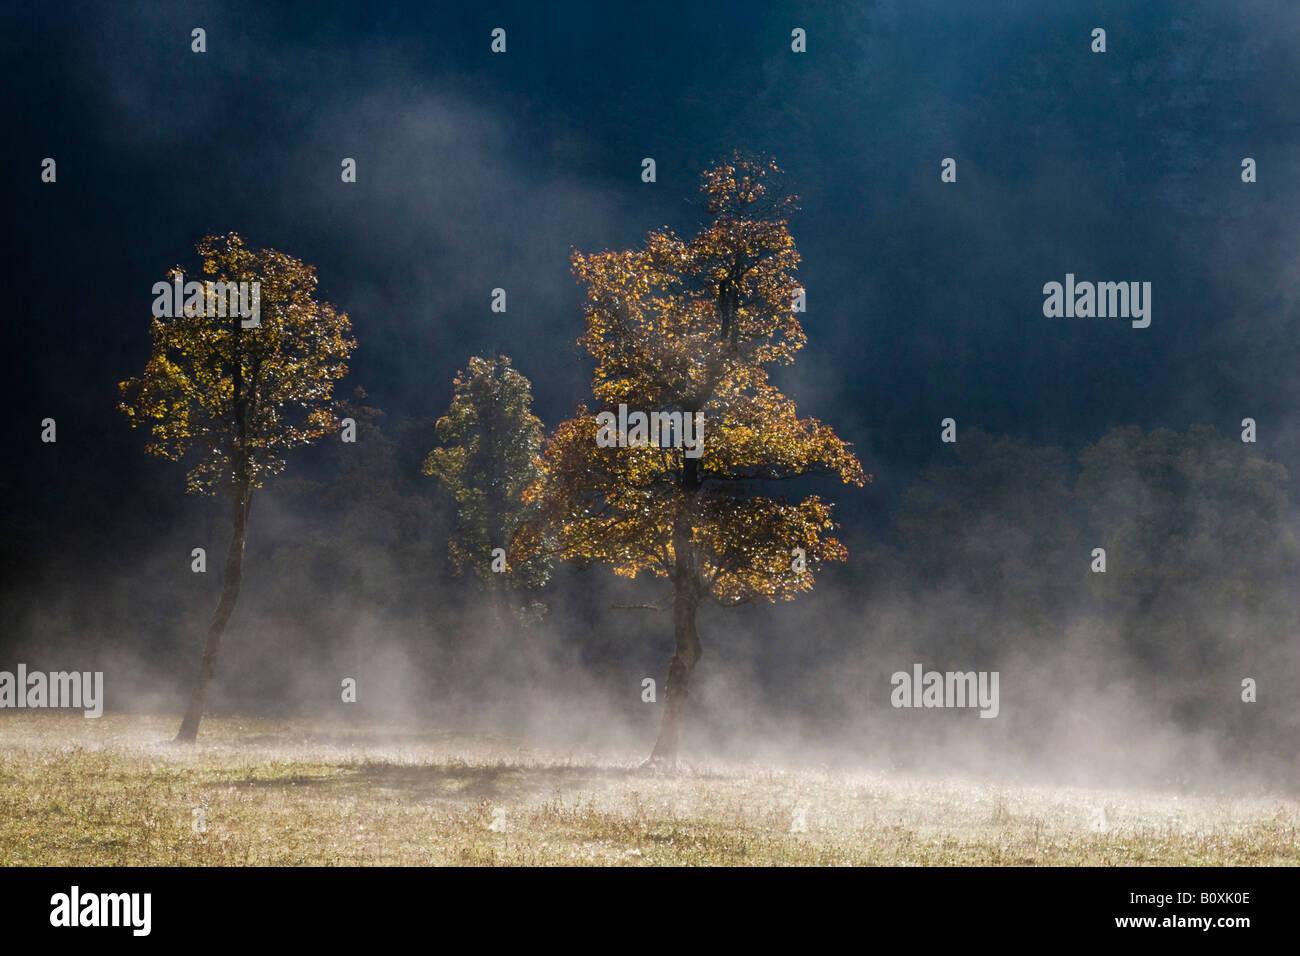 Austria, Tirol, Karwendel, Field maple tree in early morning mist - Stock Image